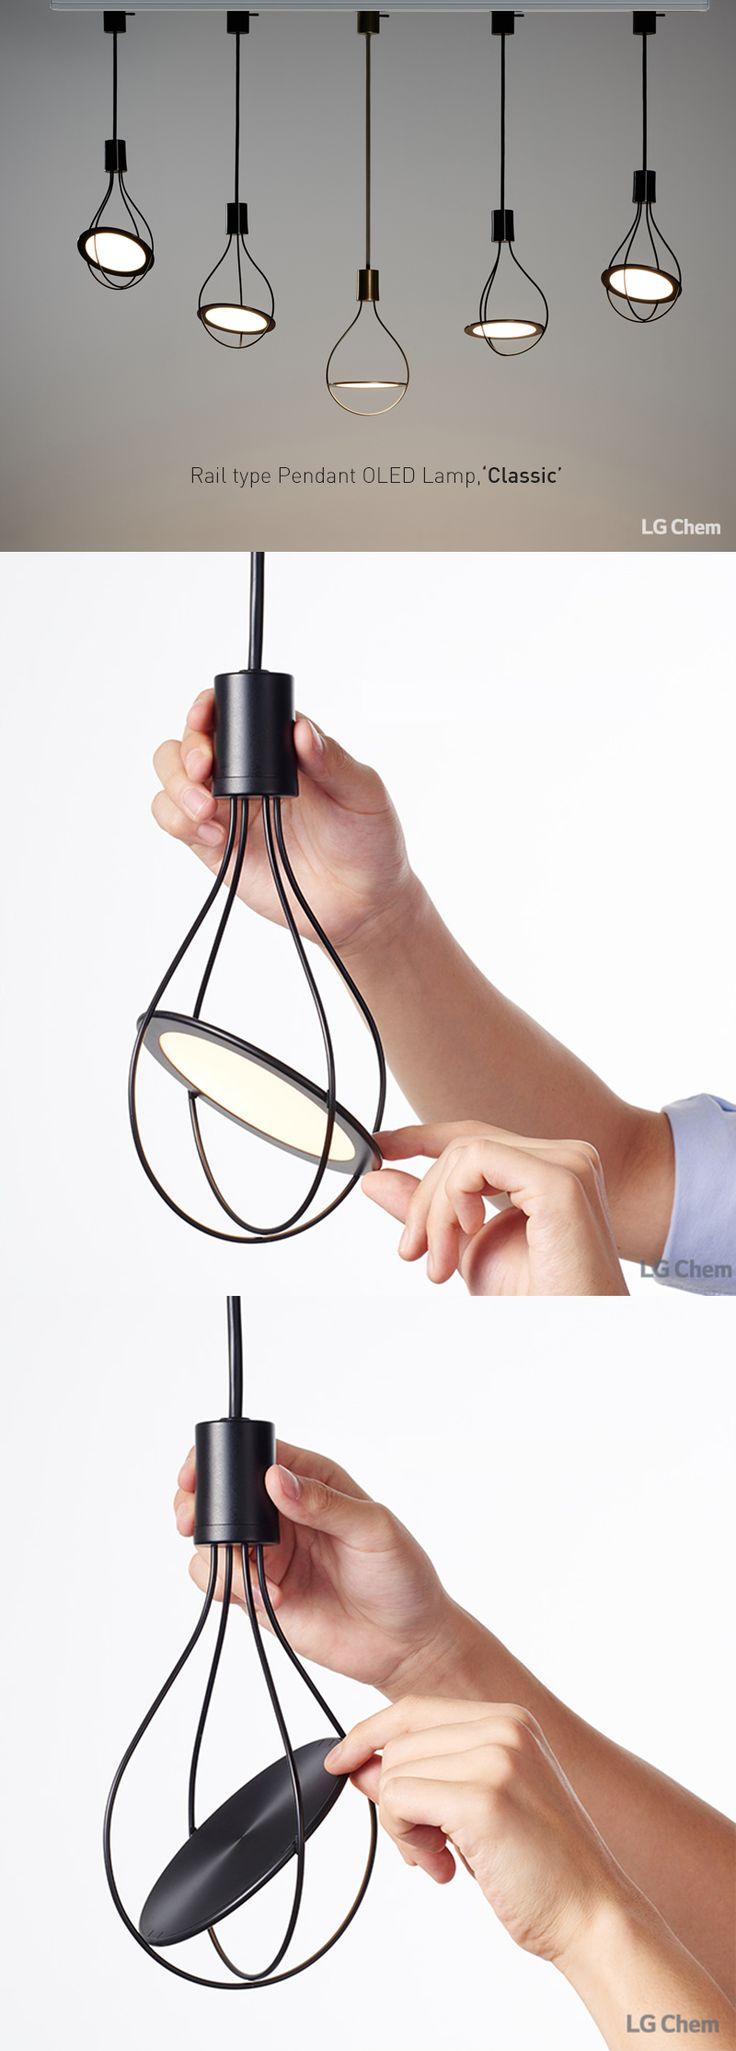 LG Display OLED Classic - the classic light bulb re-shaped using OLED technology.